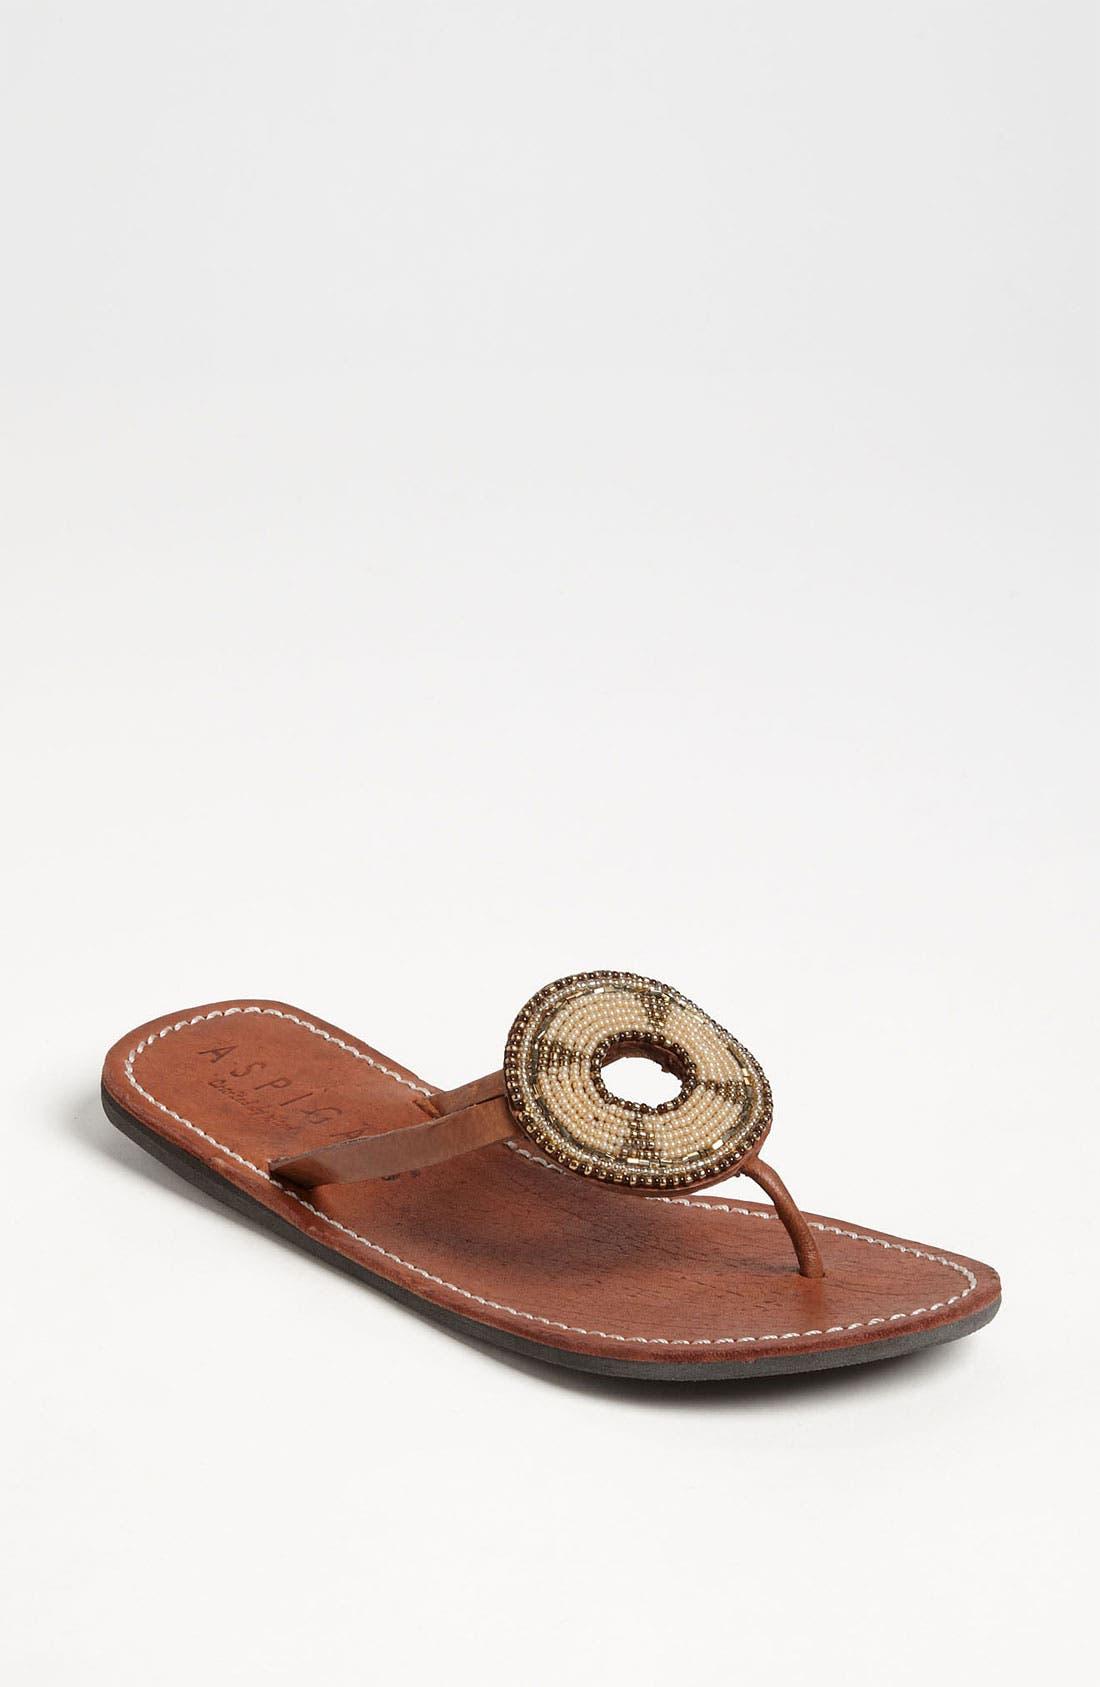 Alternate Image 1 Selected - Aspiga 'Masai Disc' Sandal